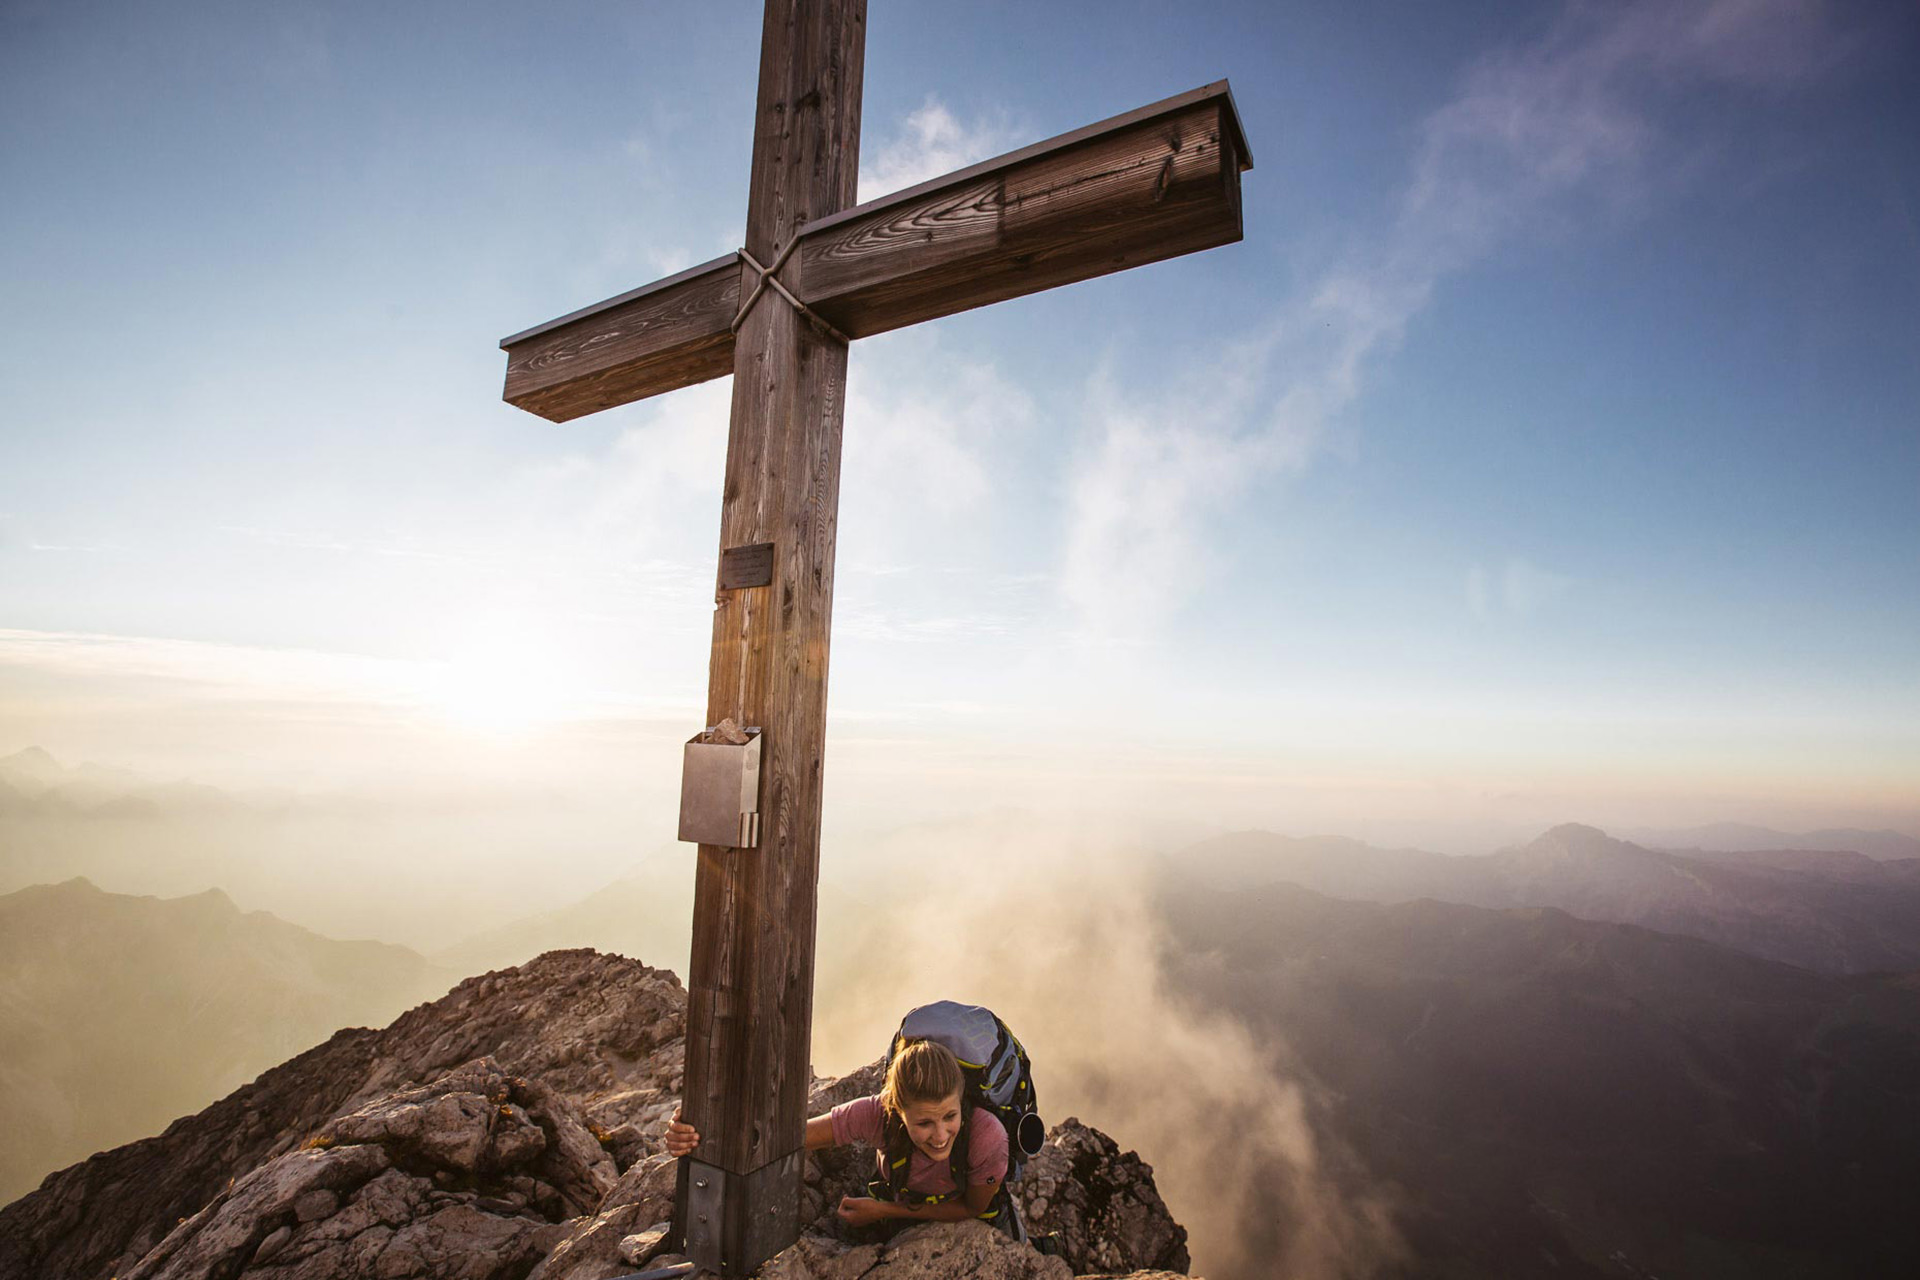 gipfel-kreuz-klettern-bergsteigen